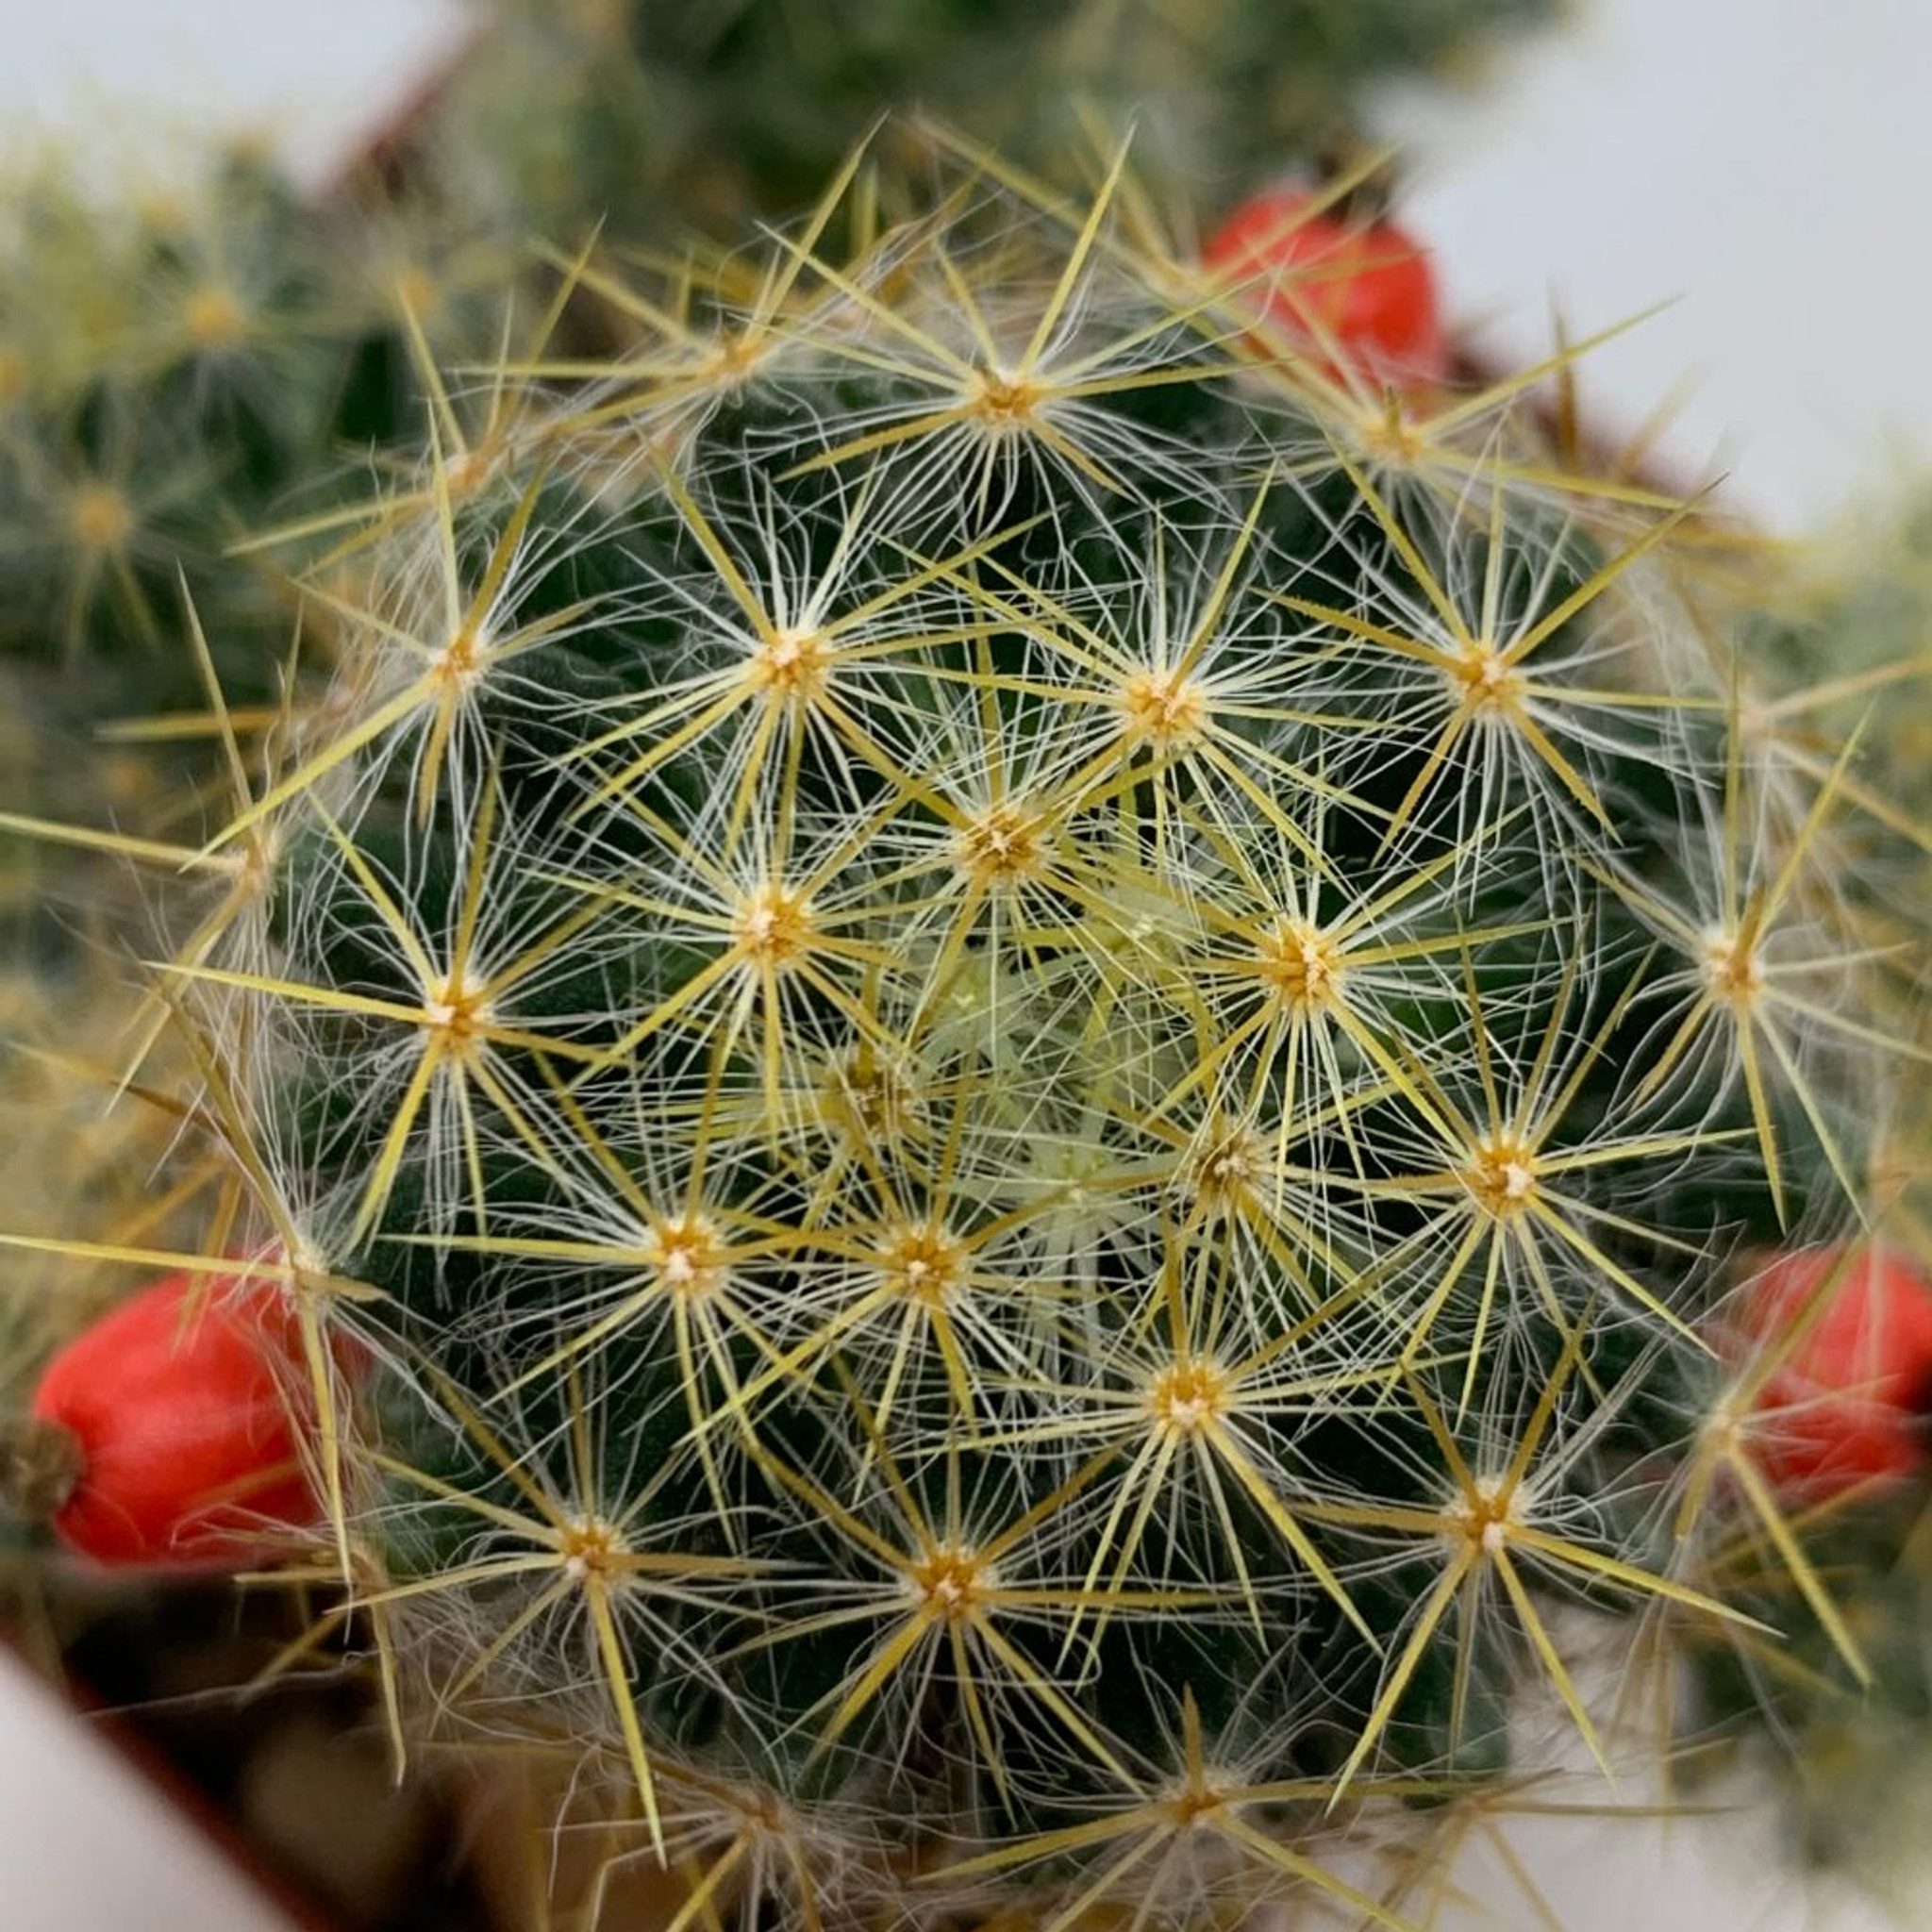 Mammillaria prolifera 'Texas Nipple Cactus'